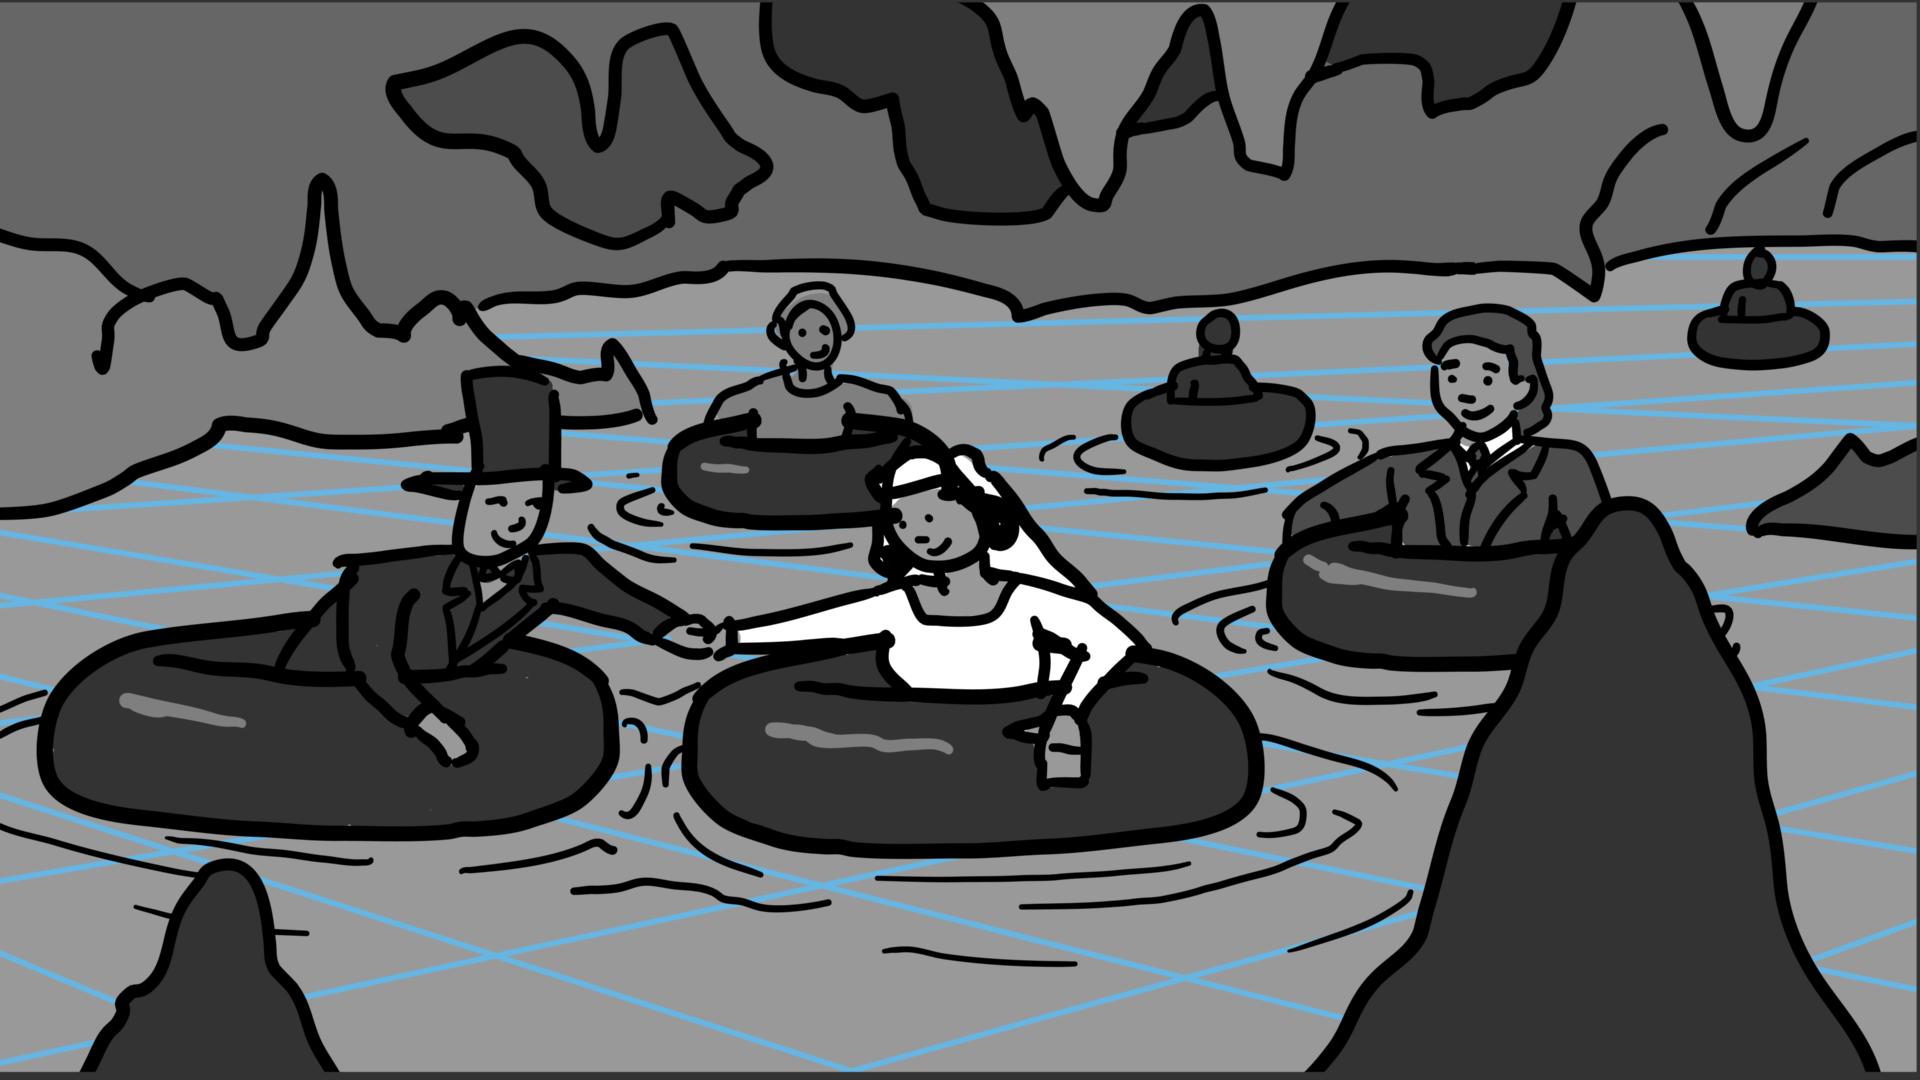 Wedding Floating Down an Underground River